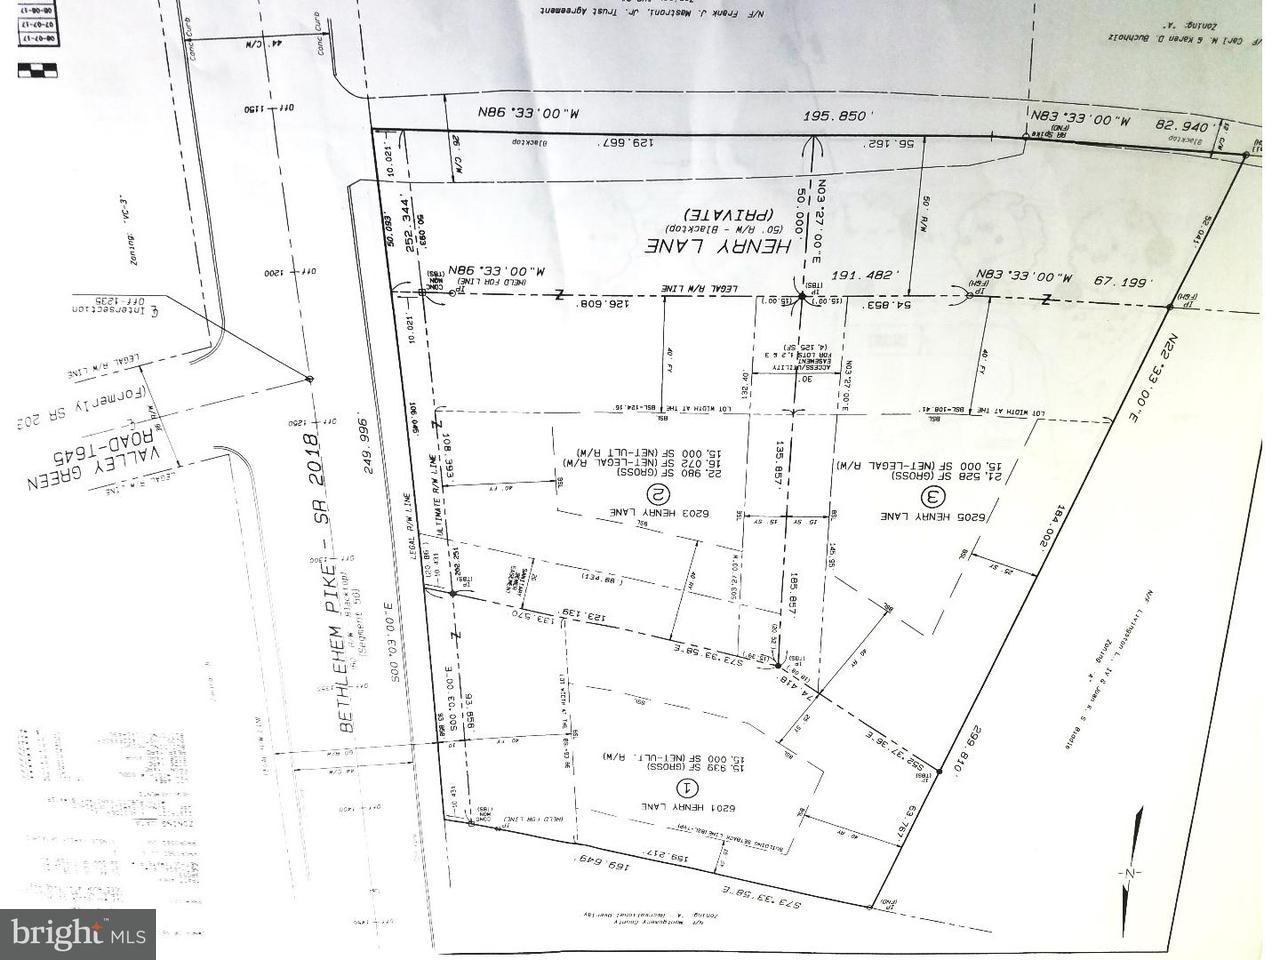 Single Family Home for Sale at 6205 HENRY Lane Flourtown, Pennsylvania 19031 United States